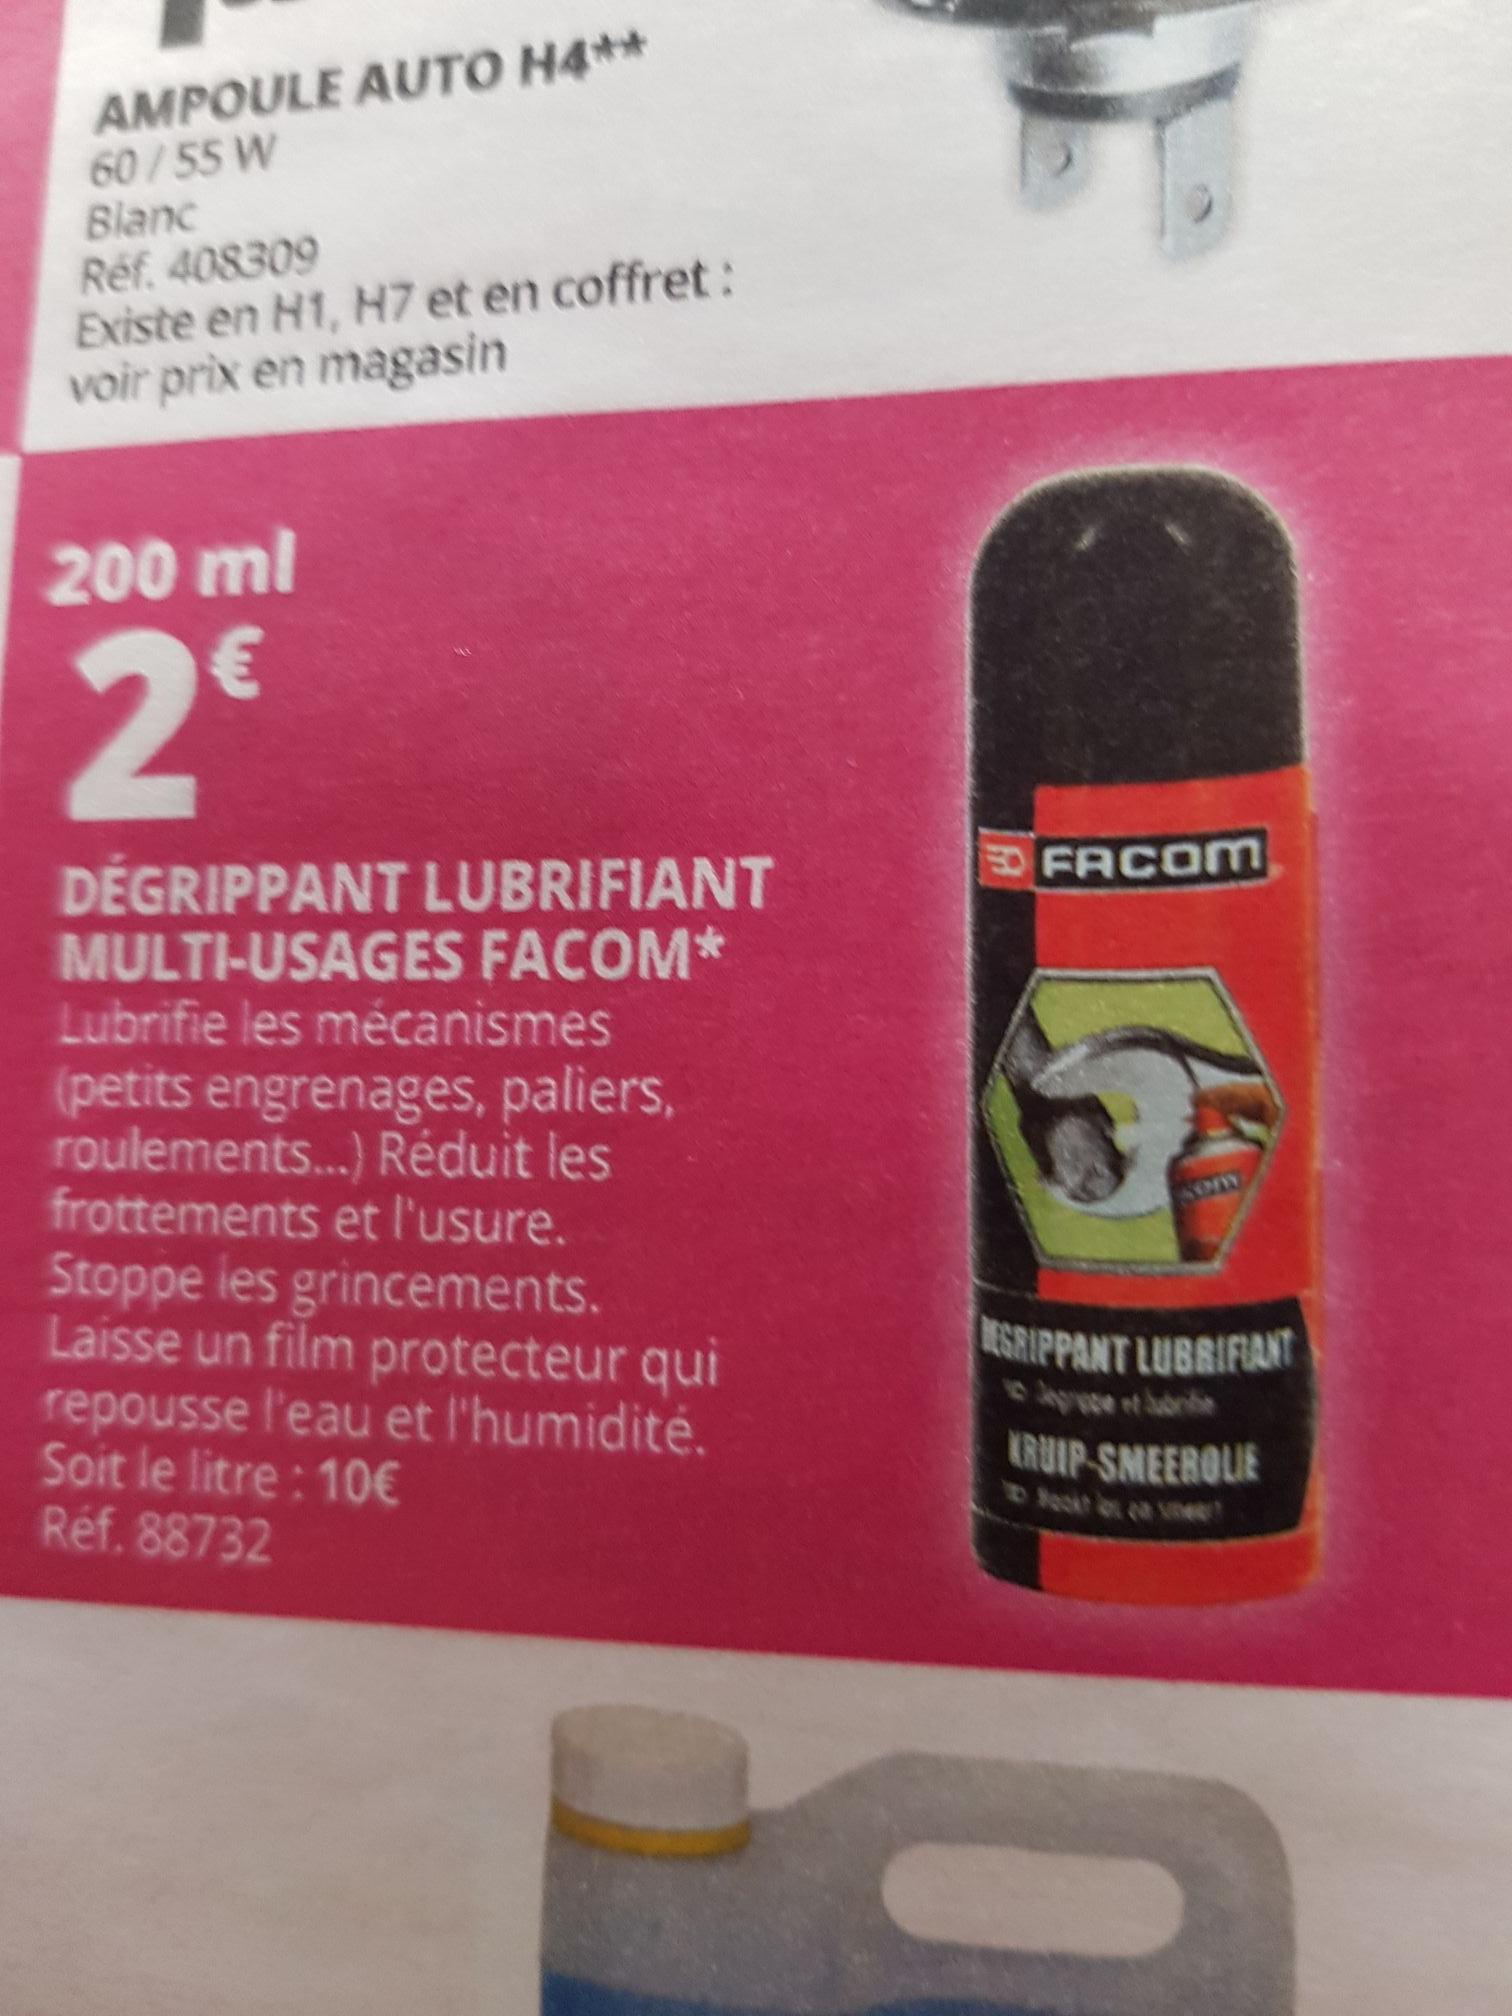 Dégrippant Lubrifiant Facom 200 ml